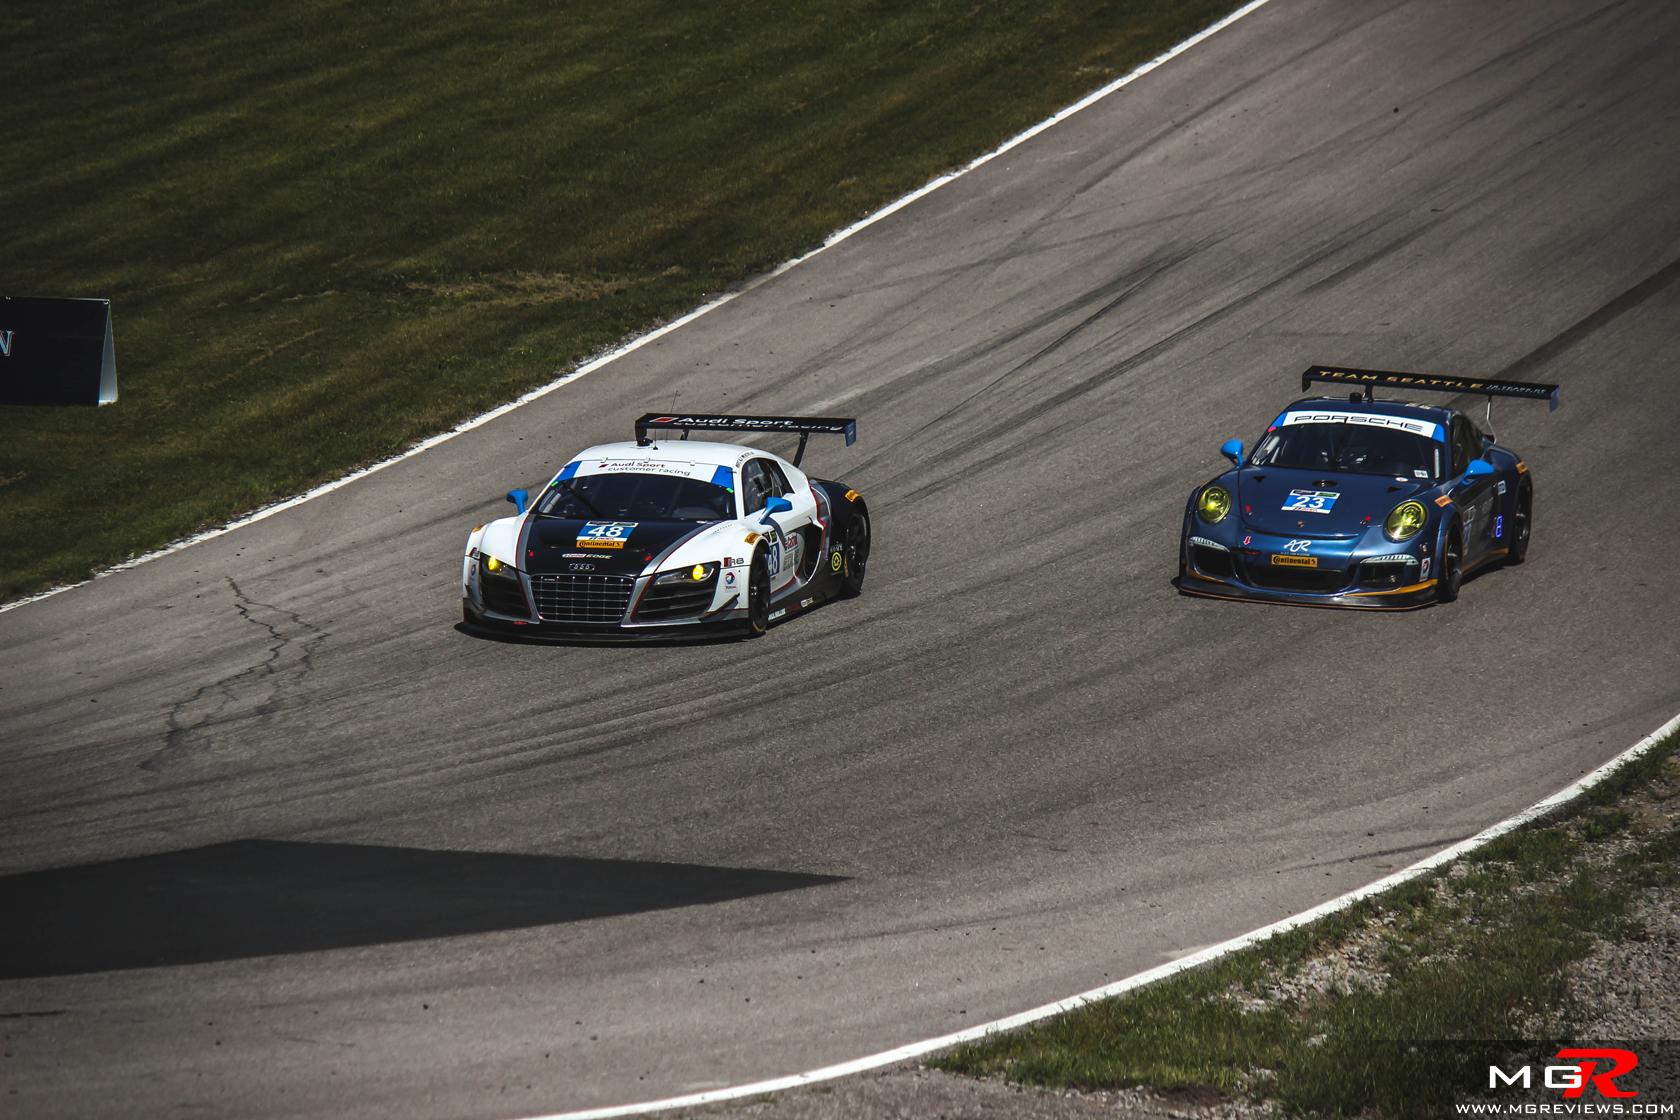 Photos: 2014 IMSA TUDOR United Sports Car Series Part 1 \u2013 Practice \u0026 Qualifying \u2013 M.G.Reviews